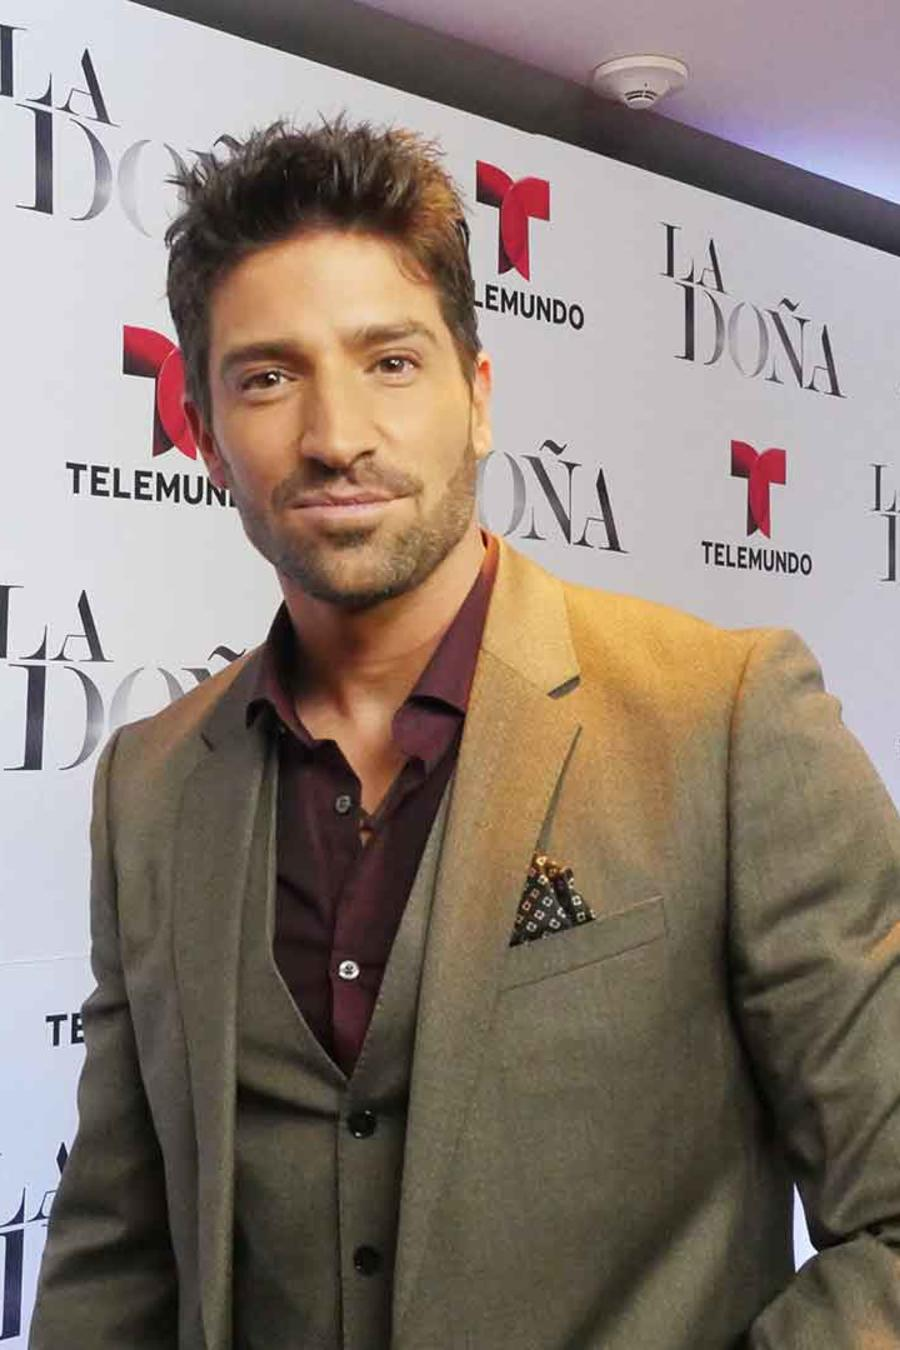 David Chocarro en la alfombra roja de La Doña